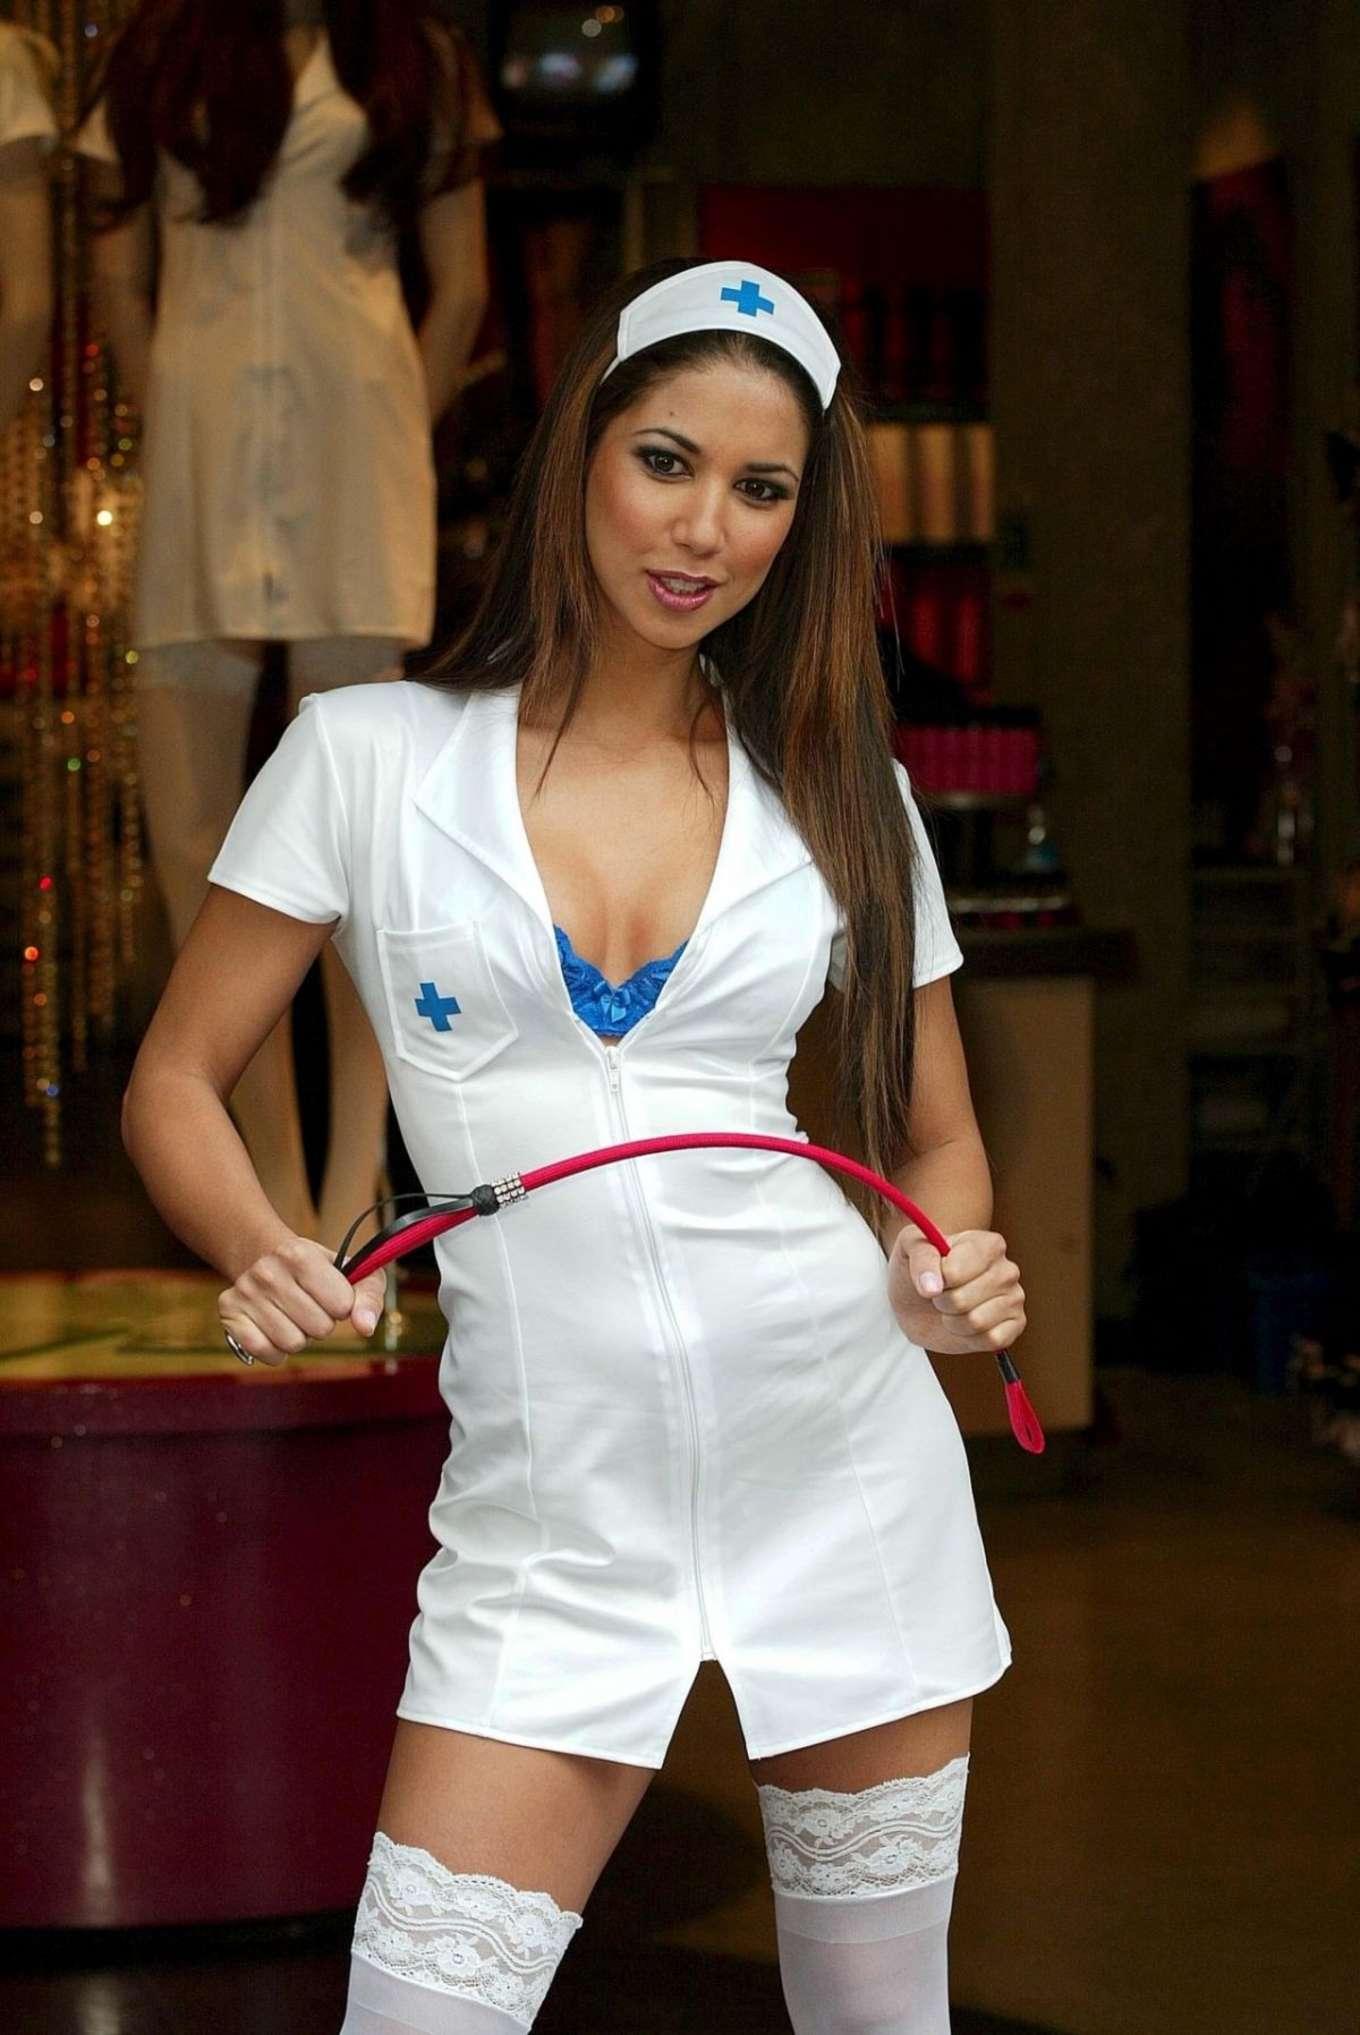 Enfermeras desnudas sexy caliente